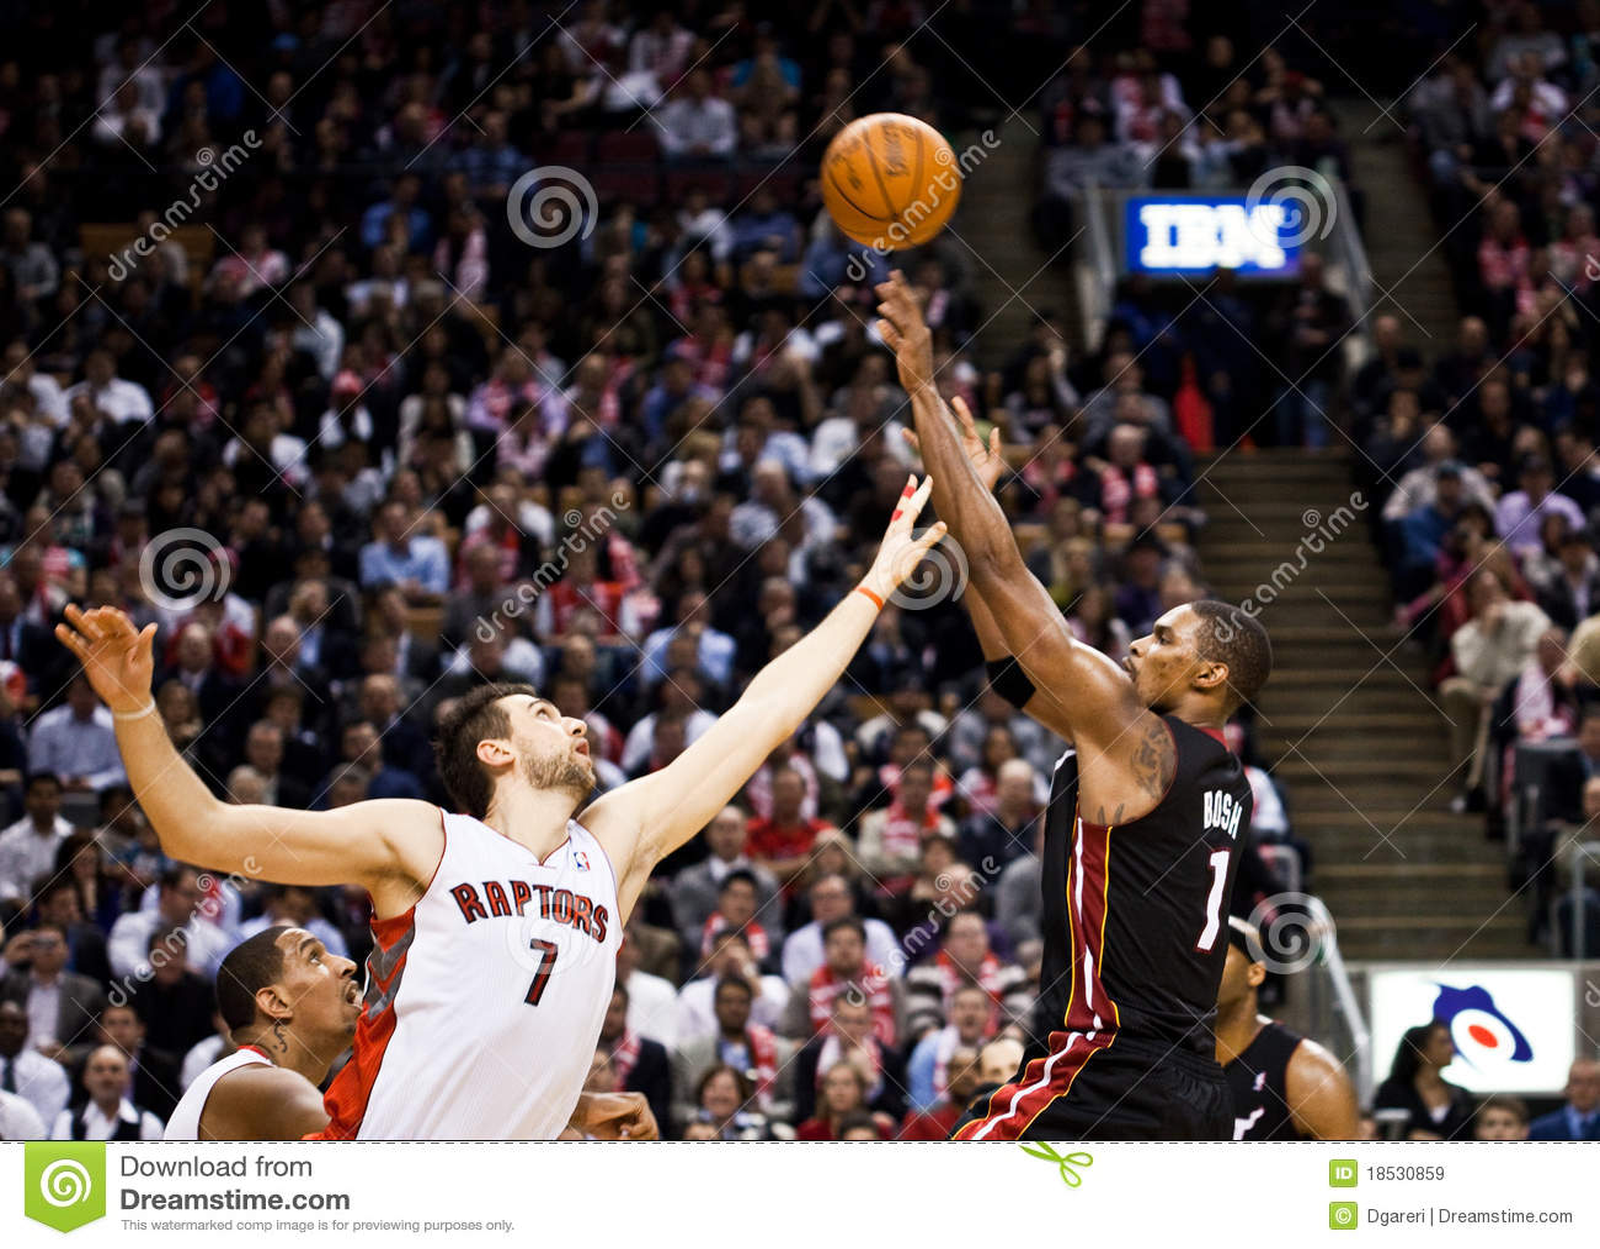 Miami Heat Vs  Toronto Raptors Editorial Stock Image - Image